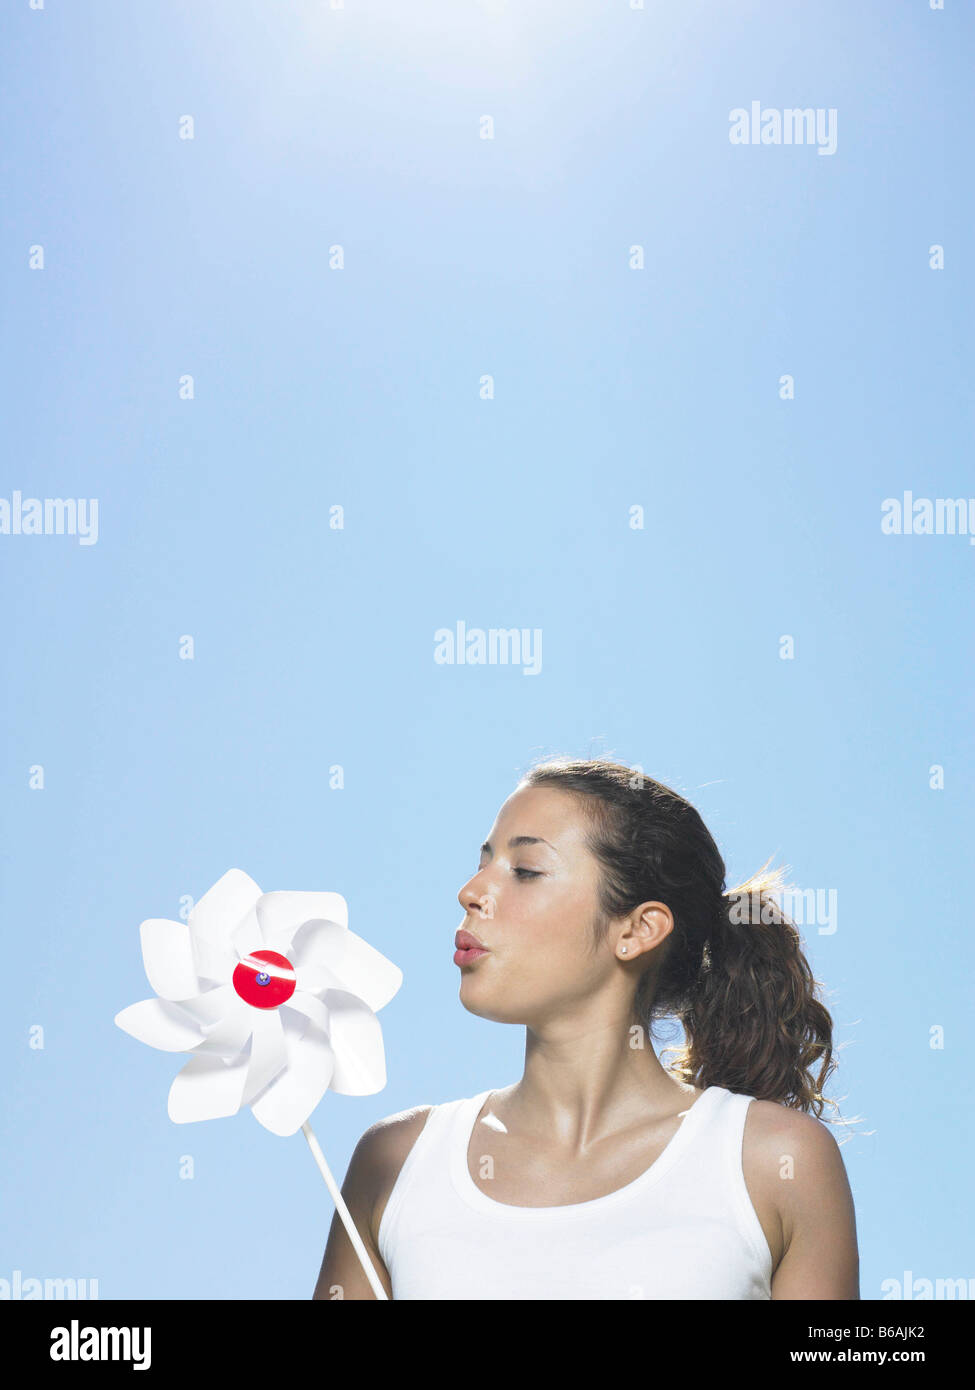 Girl blowing windmill in sun - Stock Image